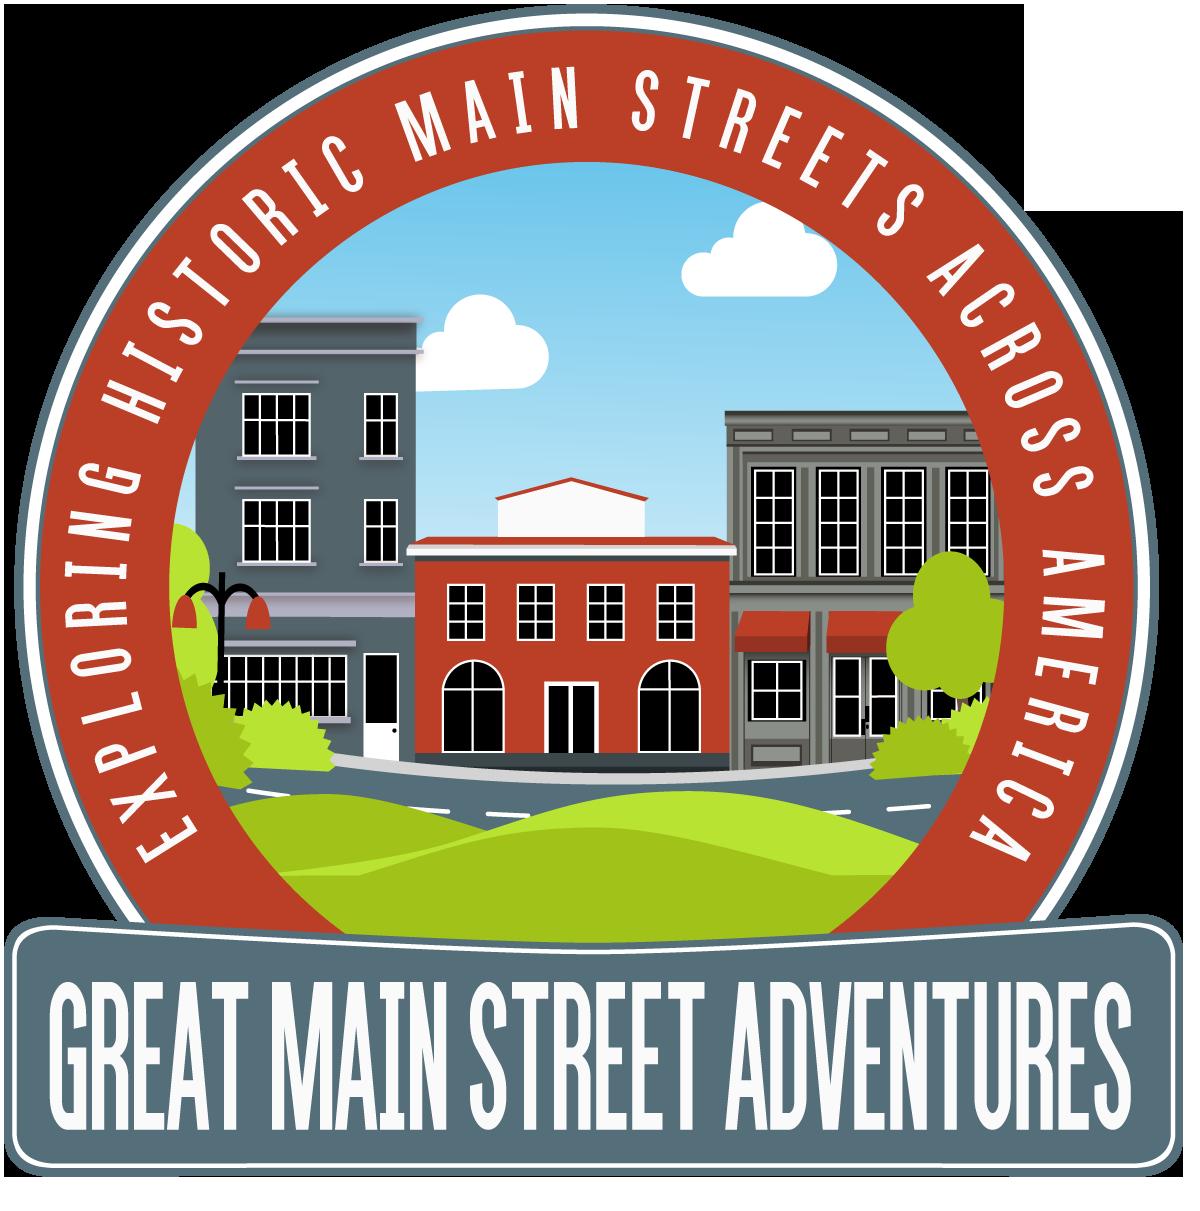 GreatMainStreetAdventure_editedFinal (2) hidden background.png